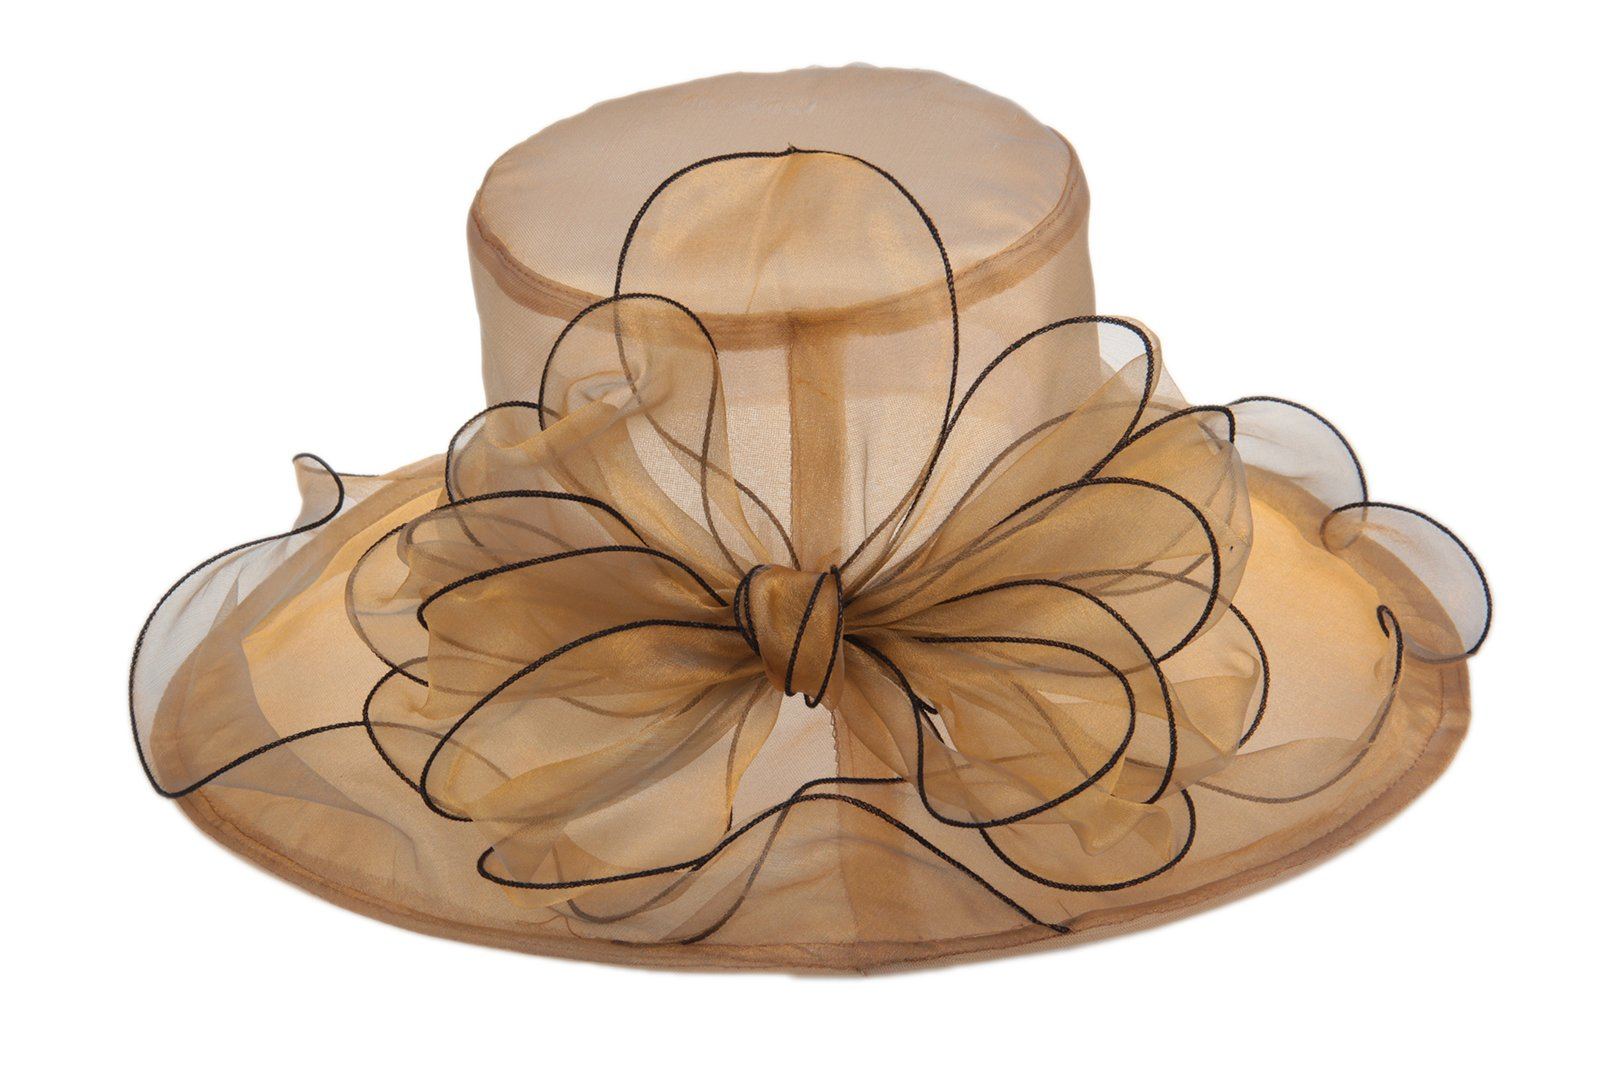 Dantiya Women's Organza Church Kentucky Derby Big Bowknot Fascinator Bridal Cap British (Gold) by Dantiya (Image #2)